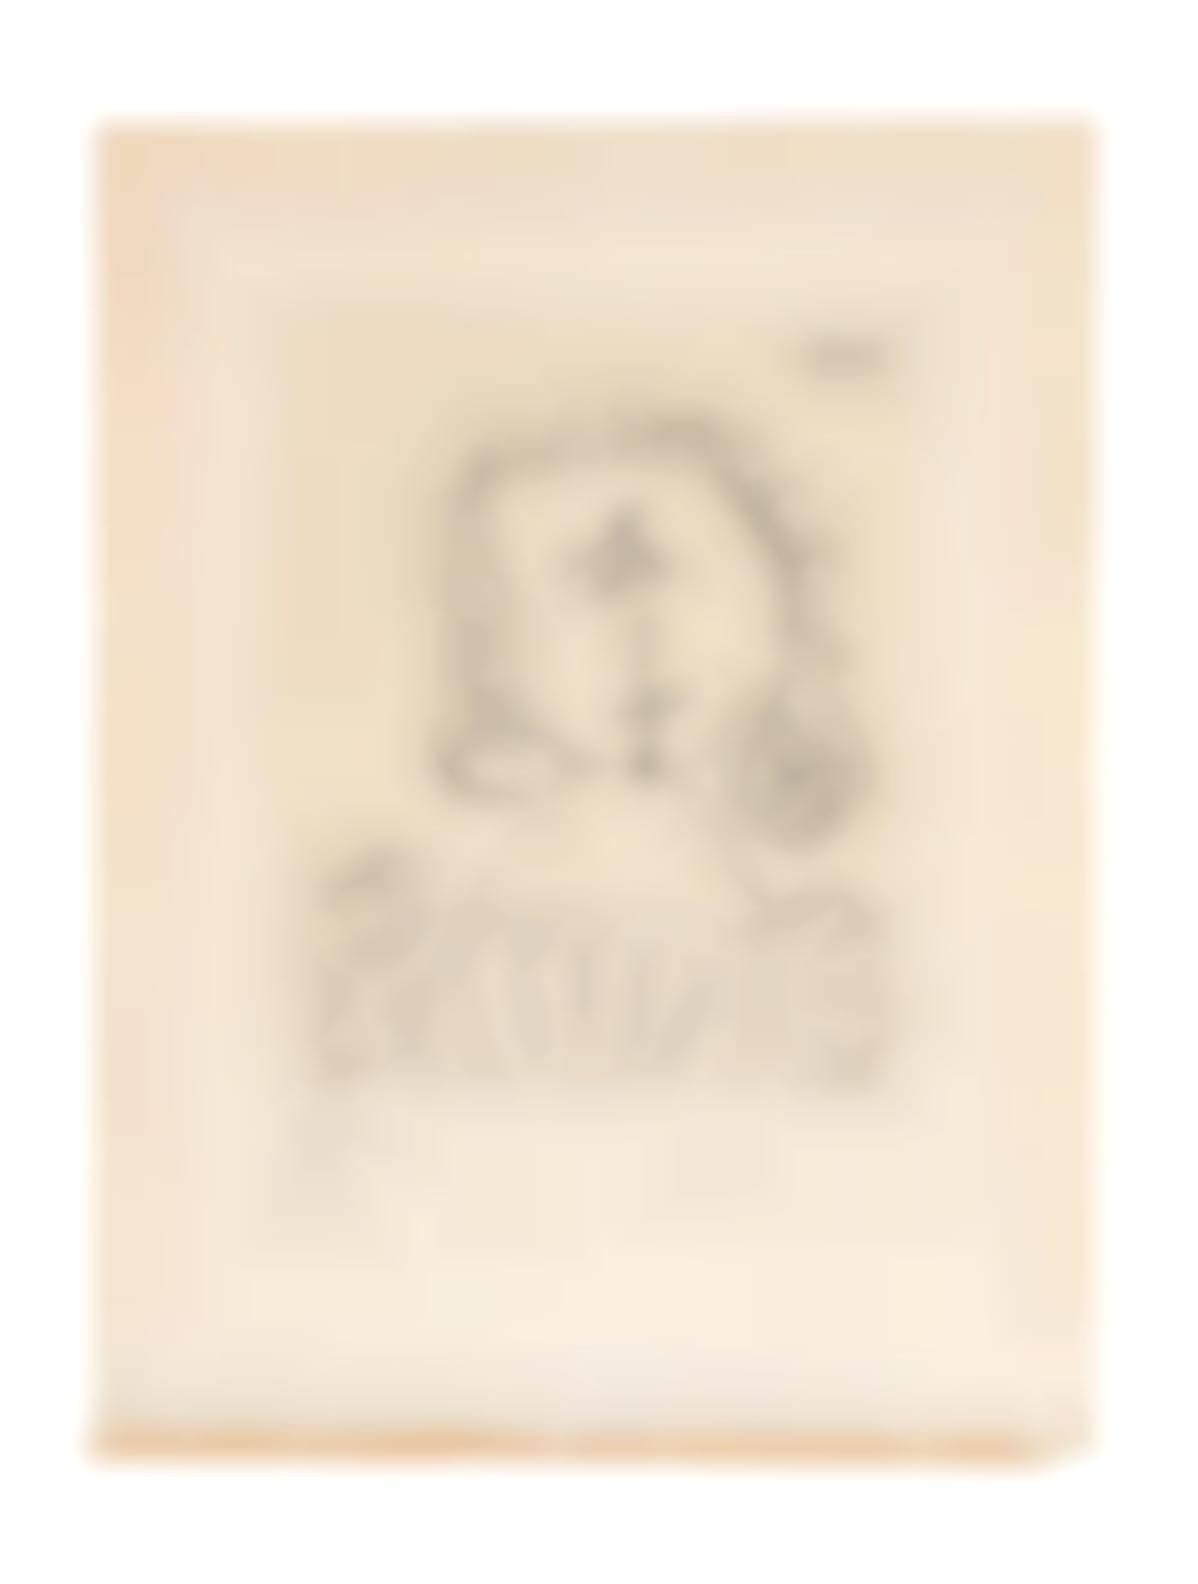 Pablo Picasso-Mousquetaire, From Doble Ensayo Sobre Picasso (Bloch1854; Baer 1479; Cramer Books 142)-1967